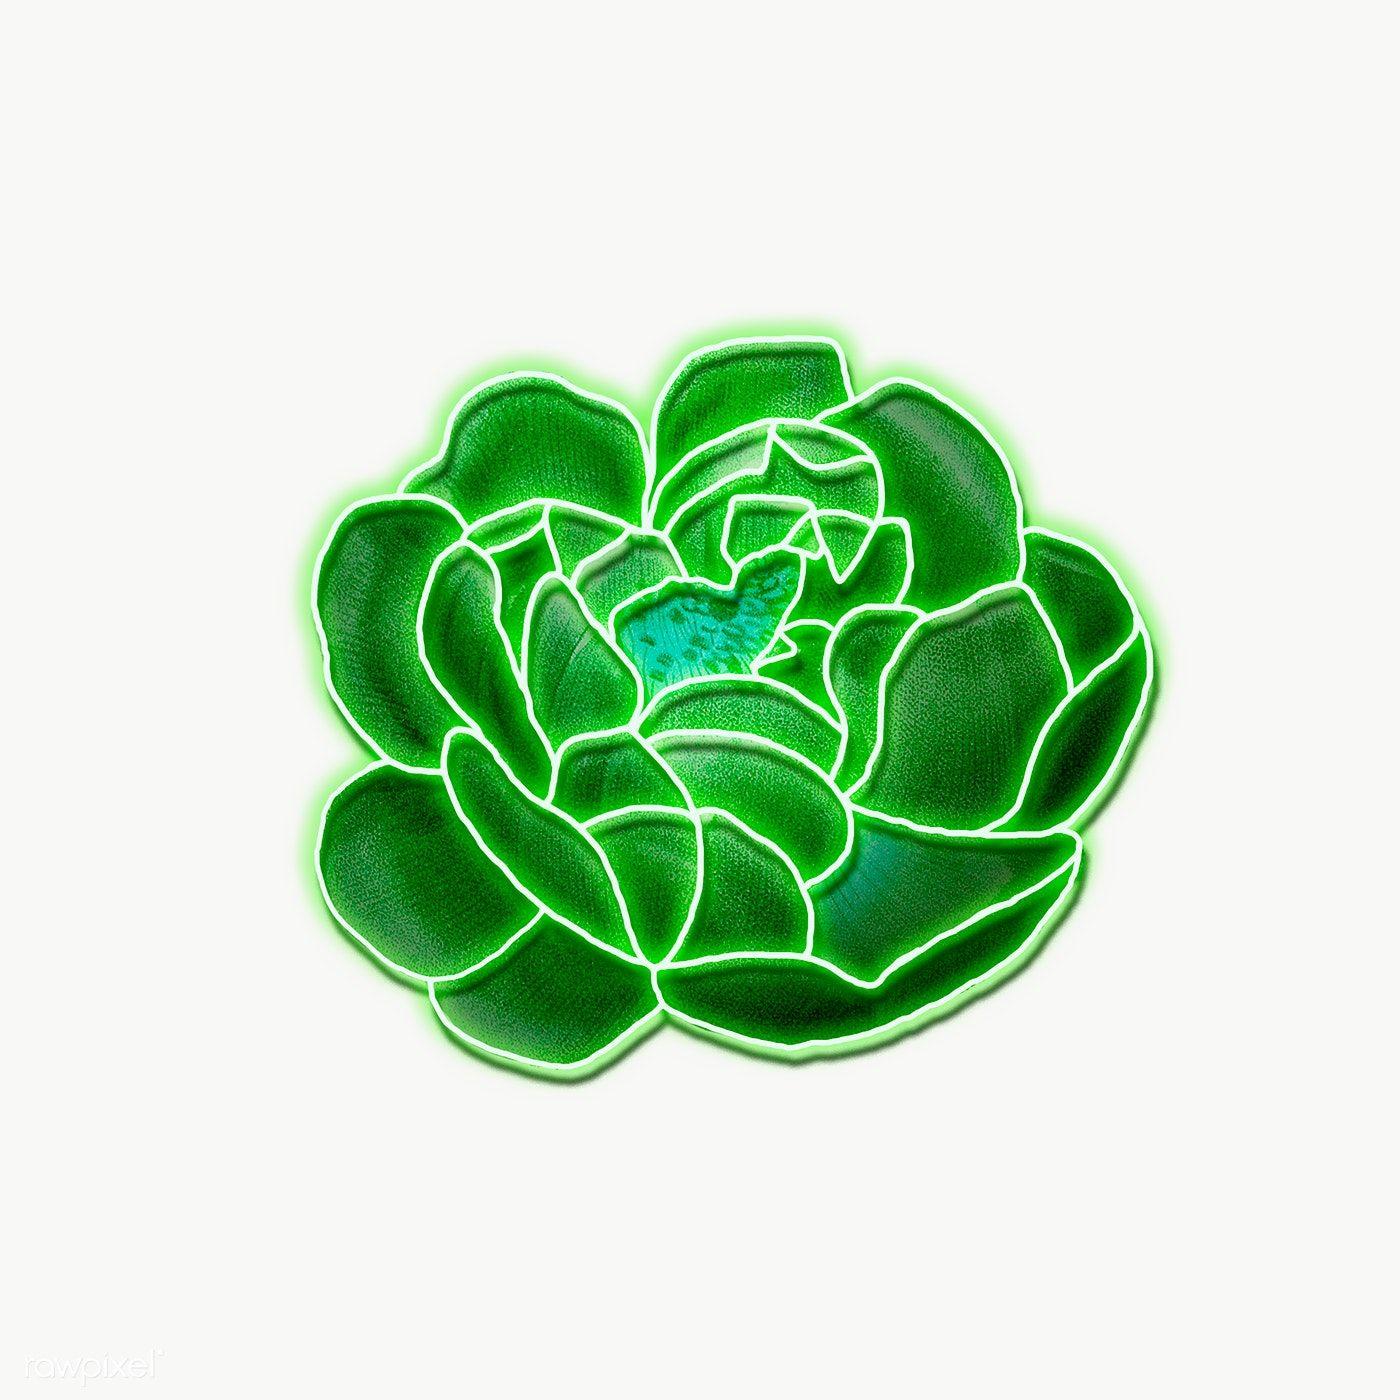 Neon Green Rose Transparent Png Premium Image By Rawpixel Com Awirwreckkwrar Flower Illustration Rose Illustration Green Rose